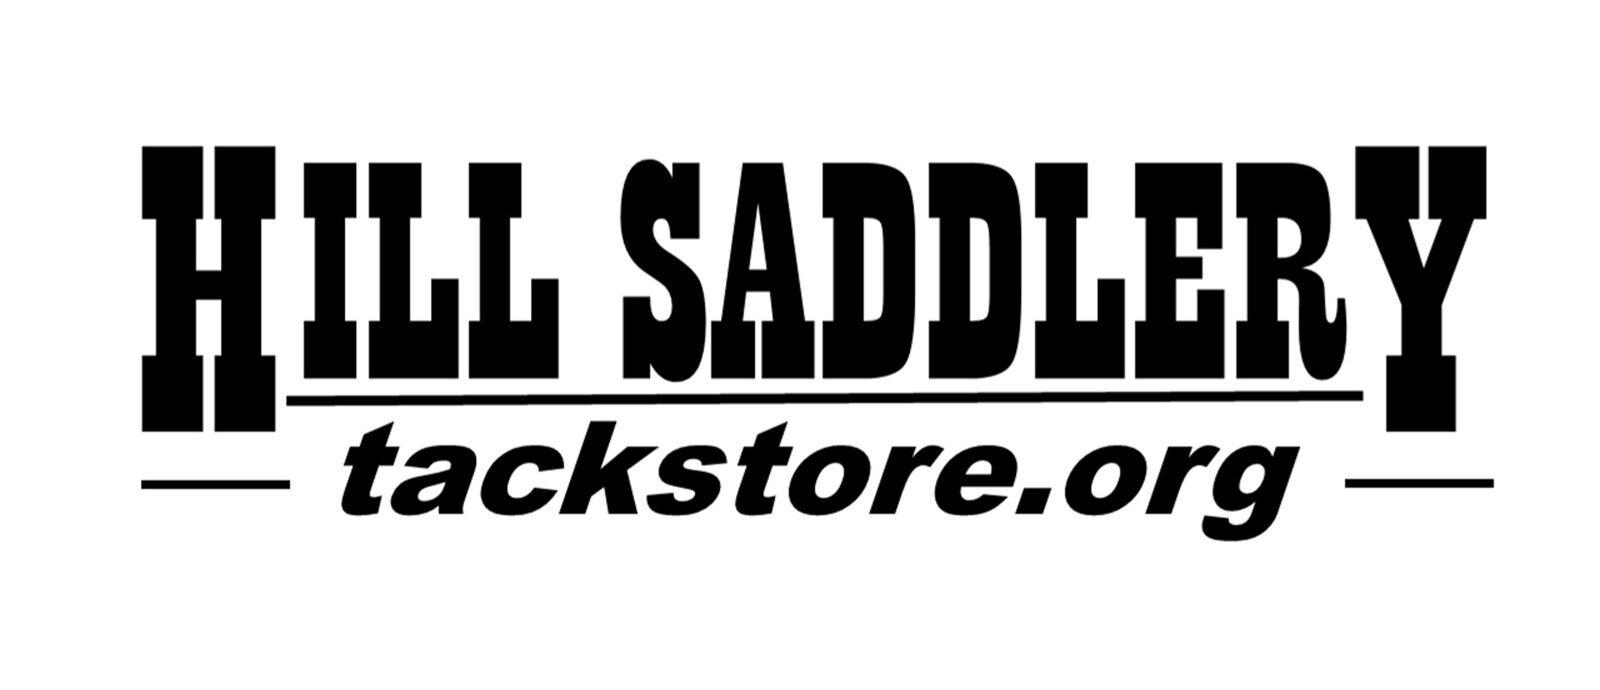 Hill Saddlery